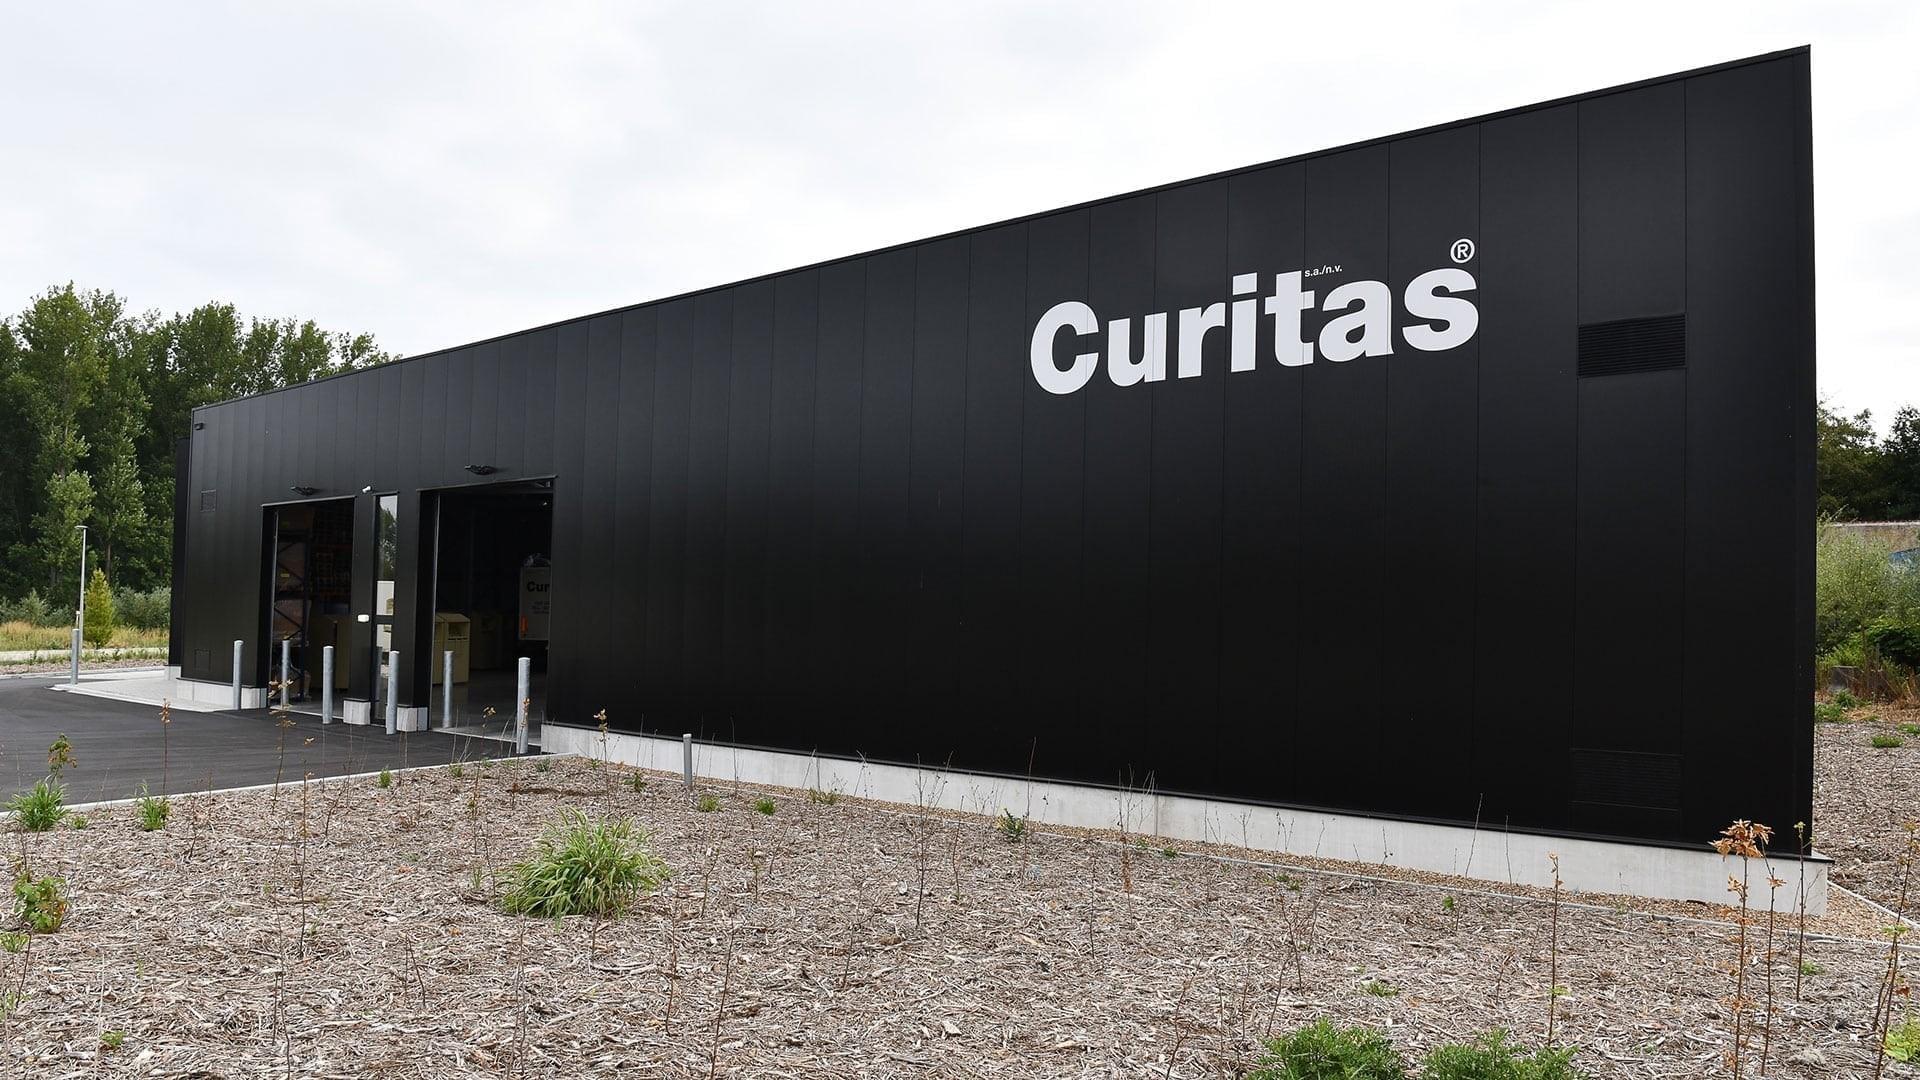 curitas-visual-1